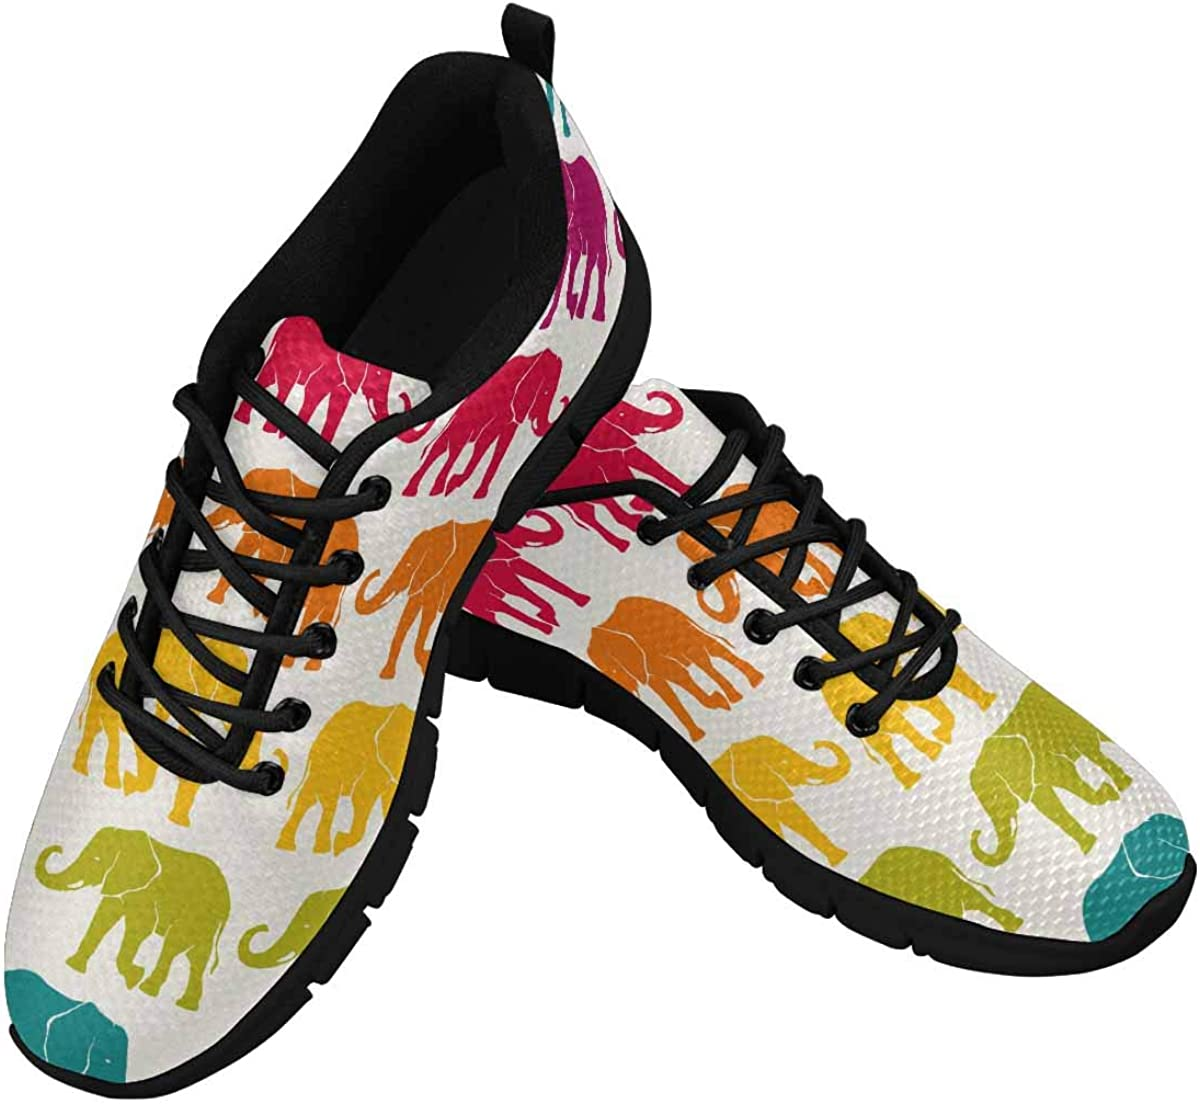 InterestPrint Cute Elephants Women's Athletic Walking Shoes Breathe Comfort Mesh